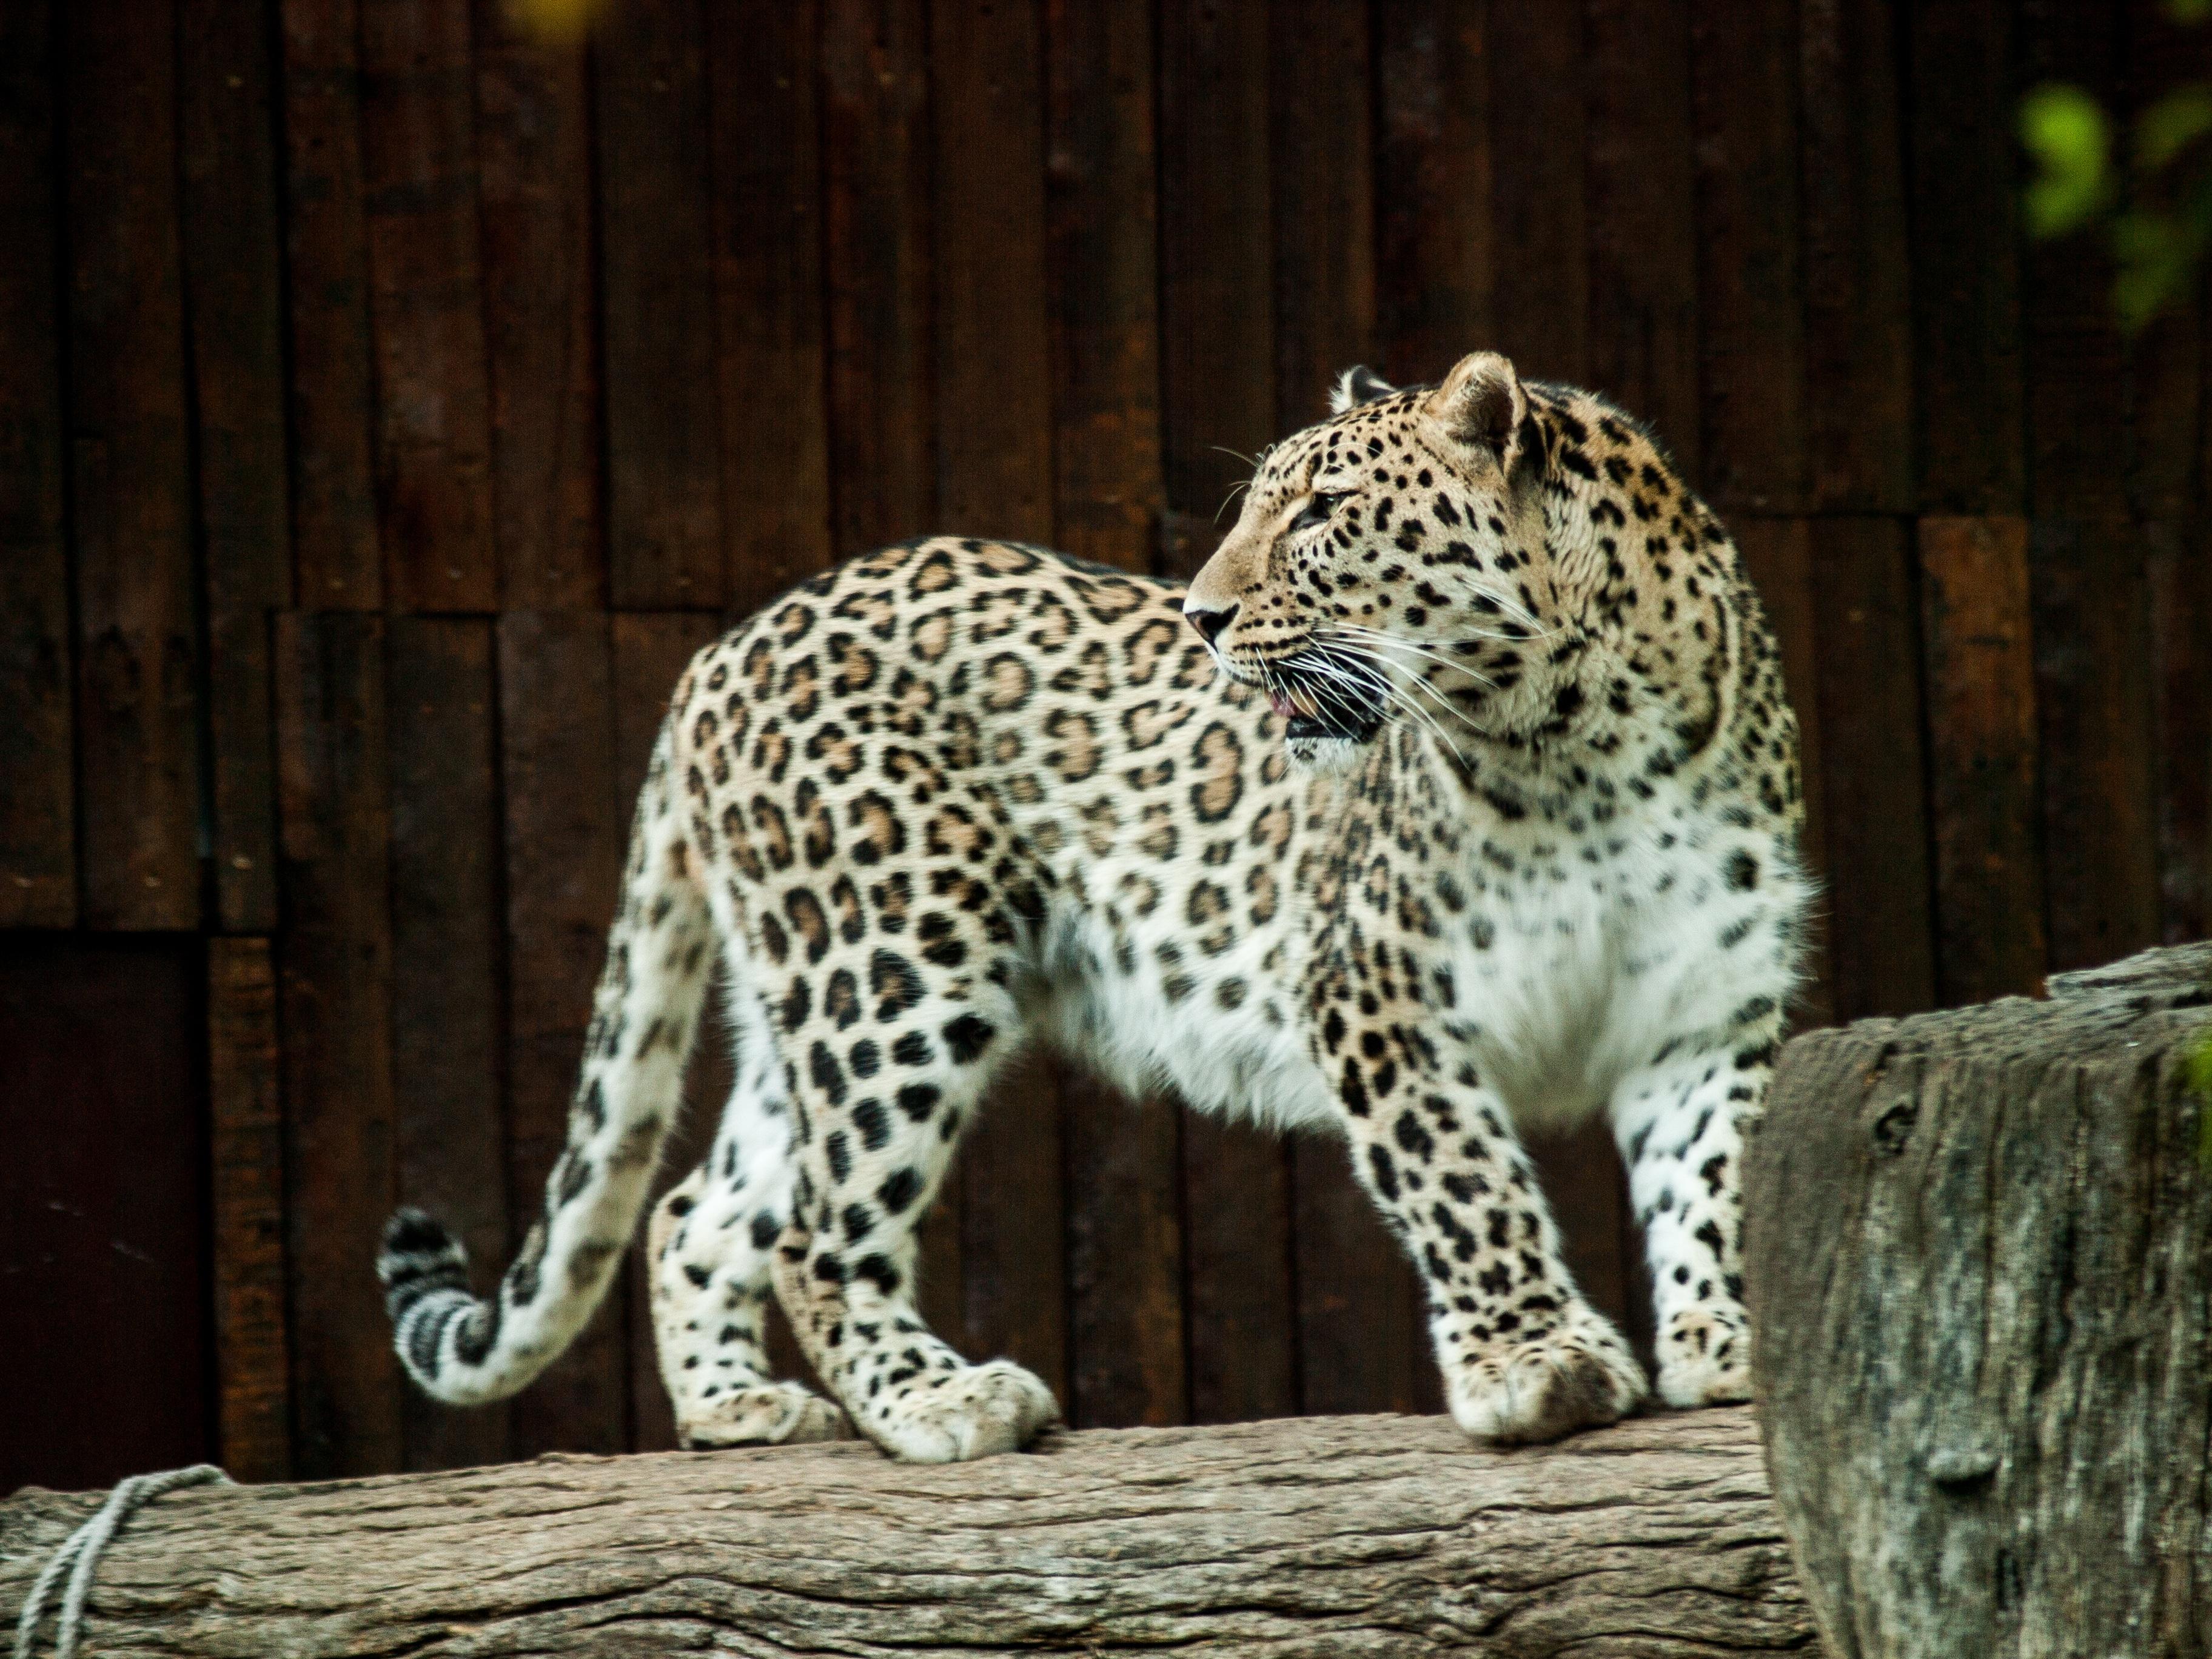 Nature Animal Wildlife Zoo Cat Feline Mammal Fauna Leopard Cheetah Claws Skin Vertebrate Jaguar Paws